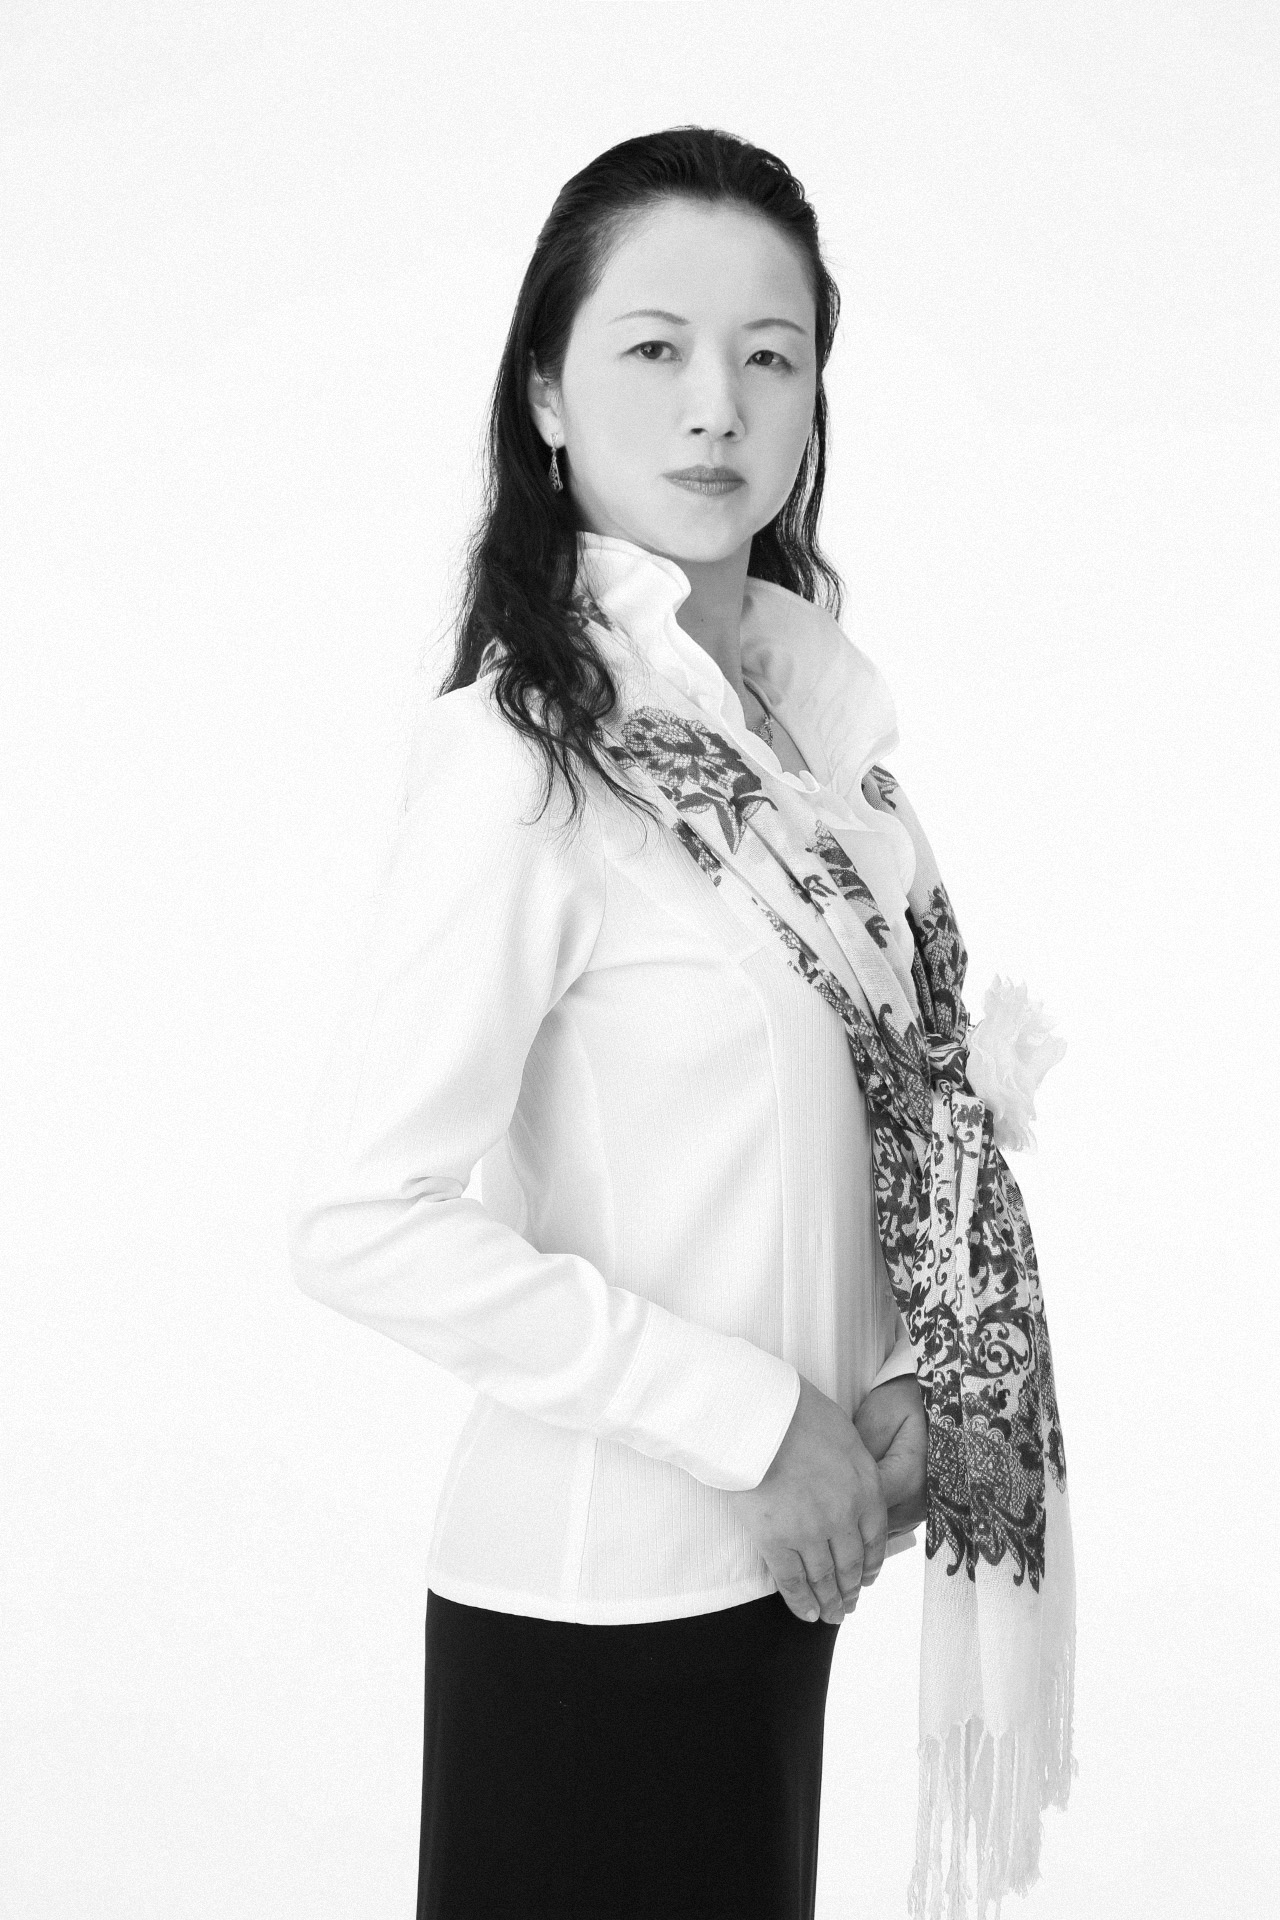 Mayumi Yoshikawa